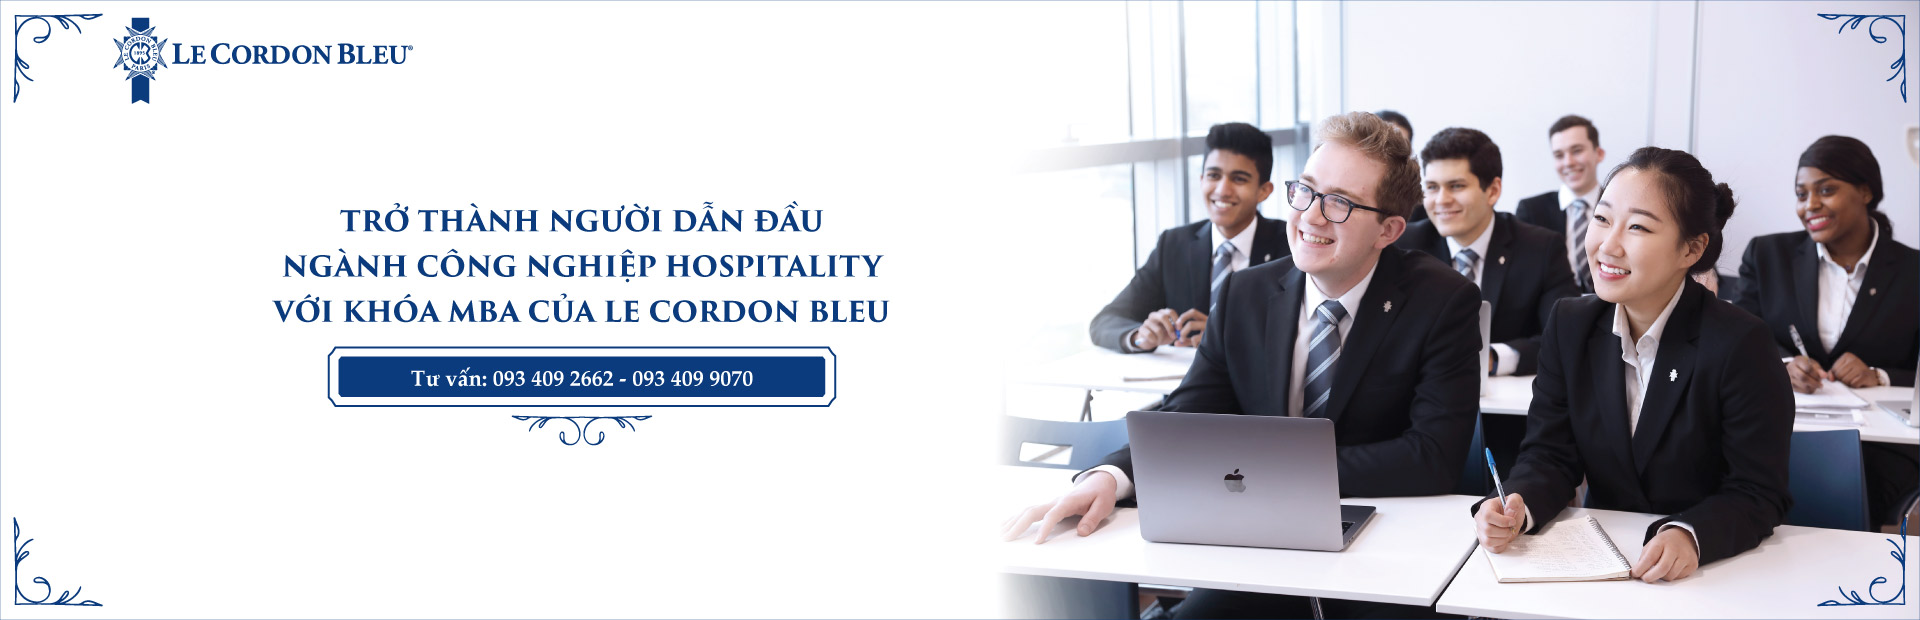 LCB MBA